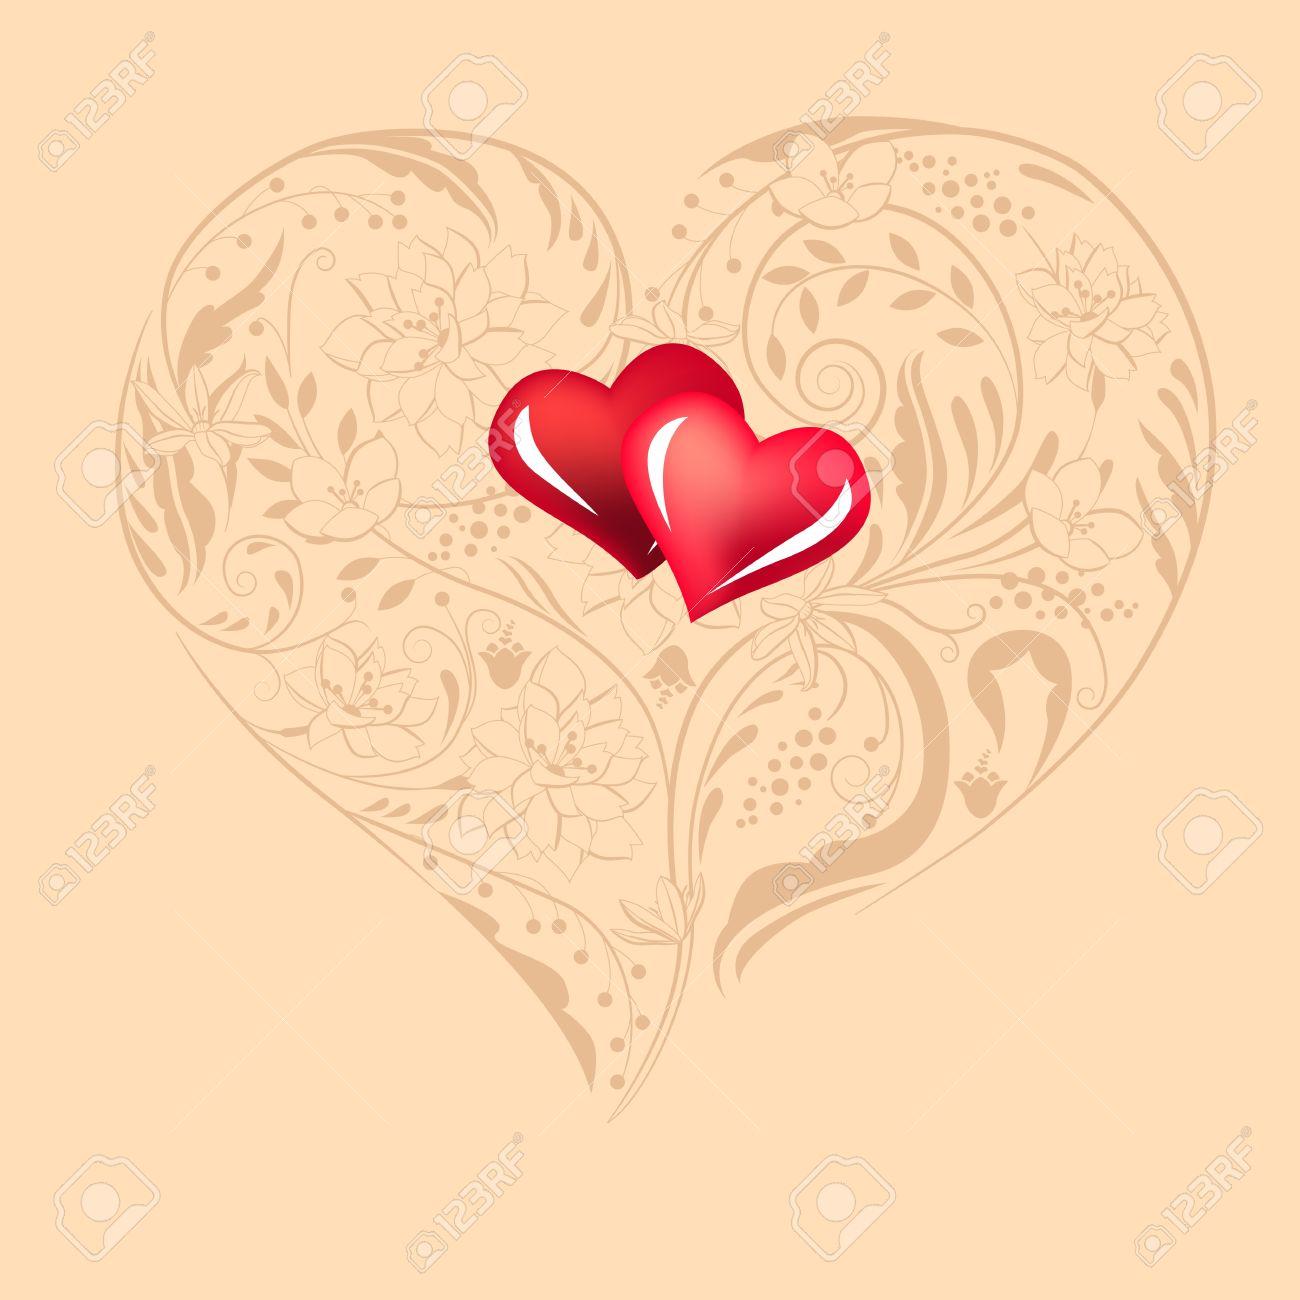 Heart shape made of flowers Stock Vector - 8584412